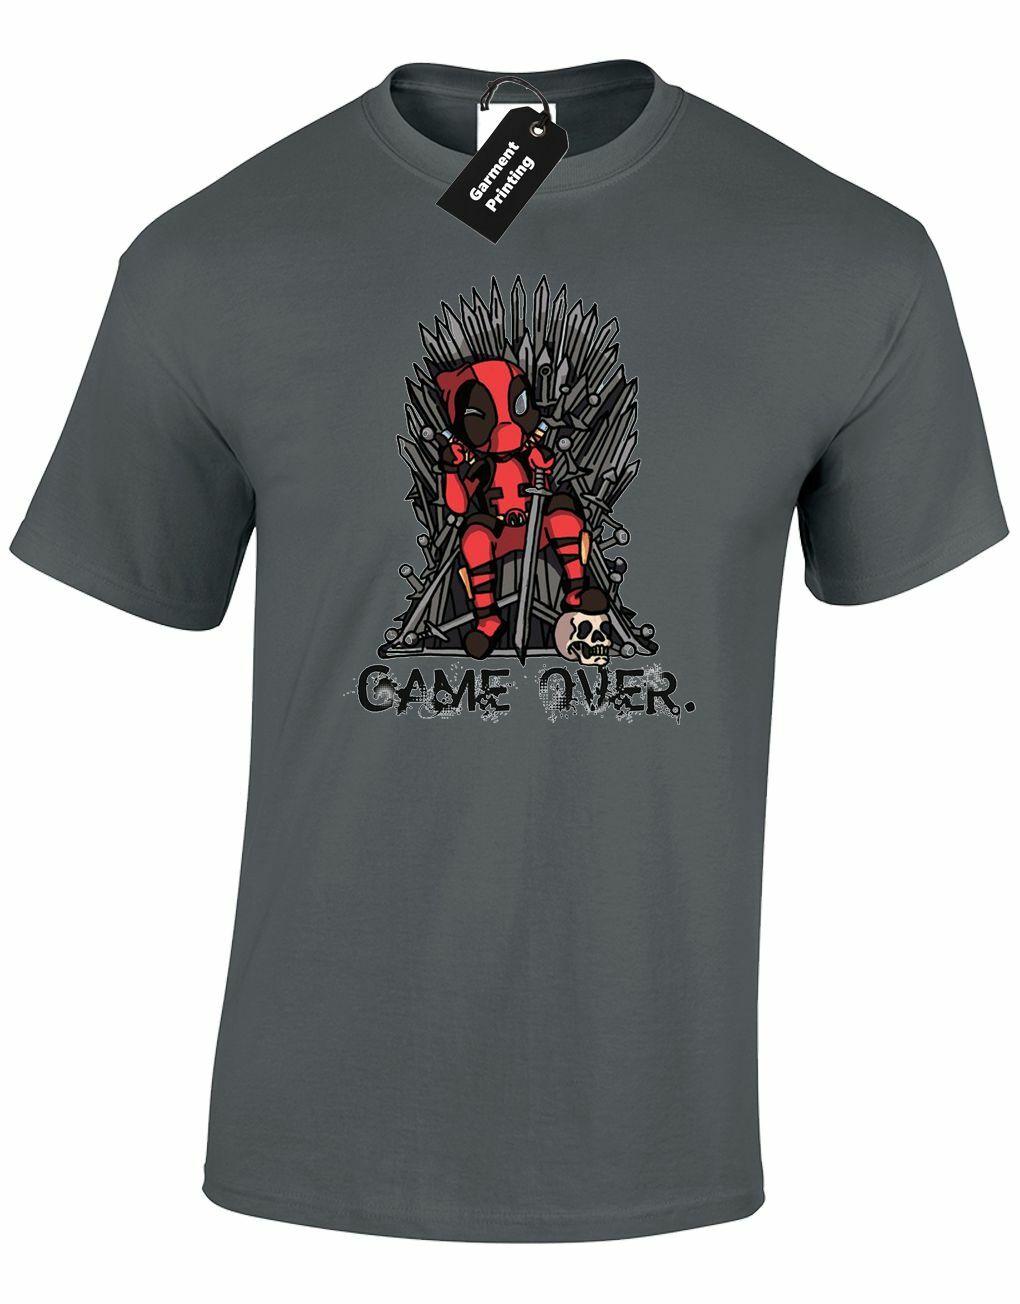 Jeu de DEADPOOL hommes t-shirt drôle trônes JON SNOW IRON HULK TYRION homme TOP 2019 mode t-shirt, Hip Hop t-shirt drôle